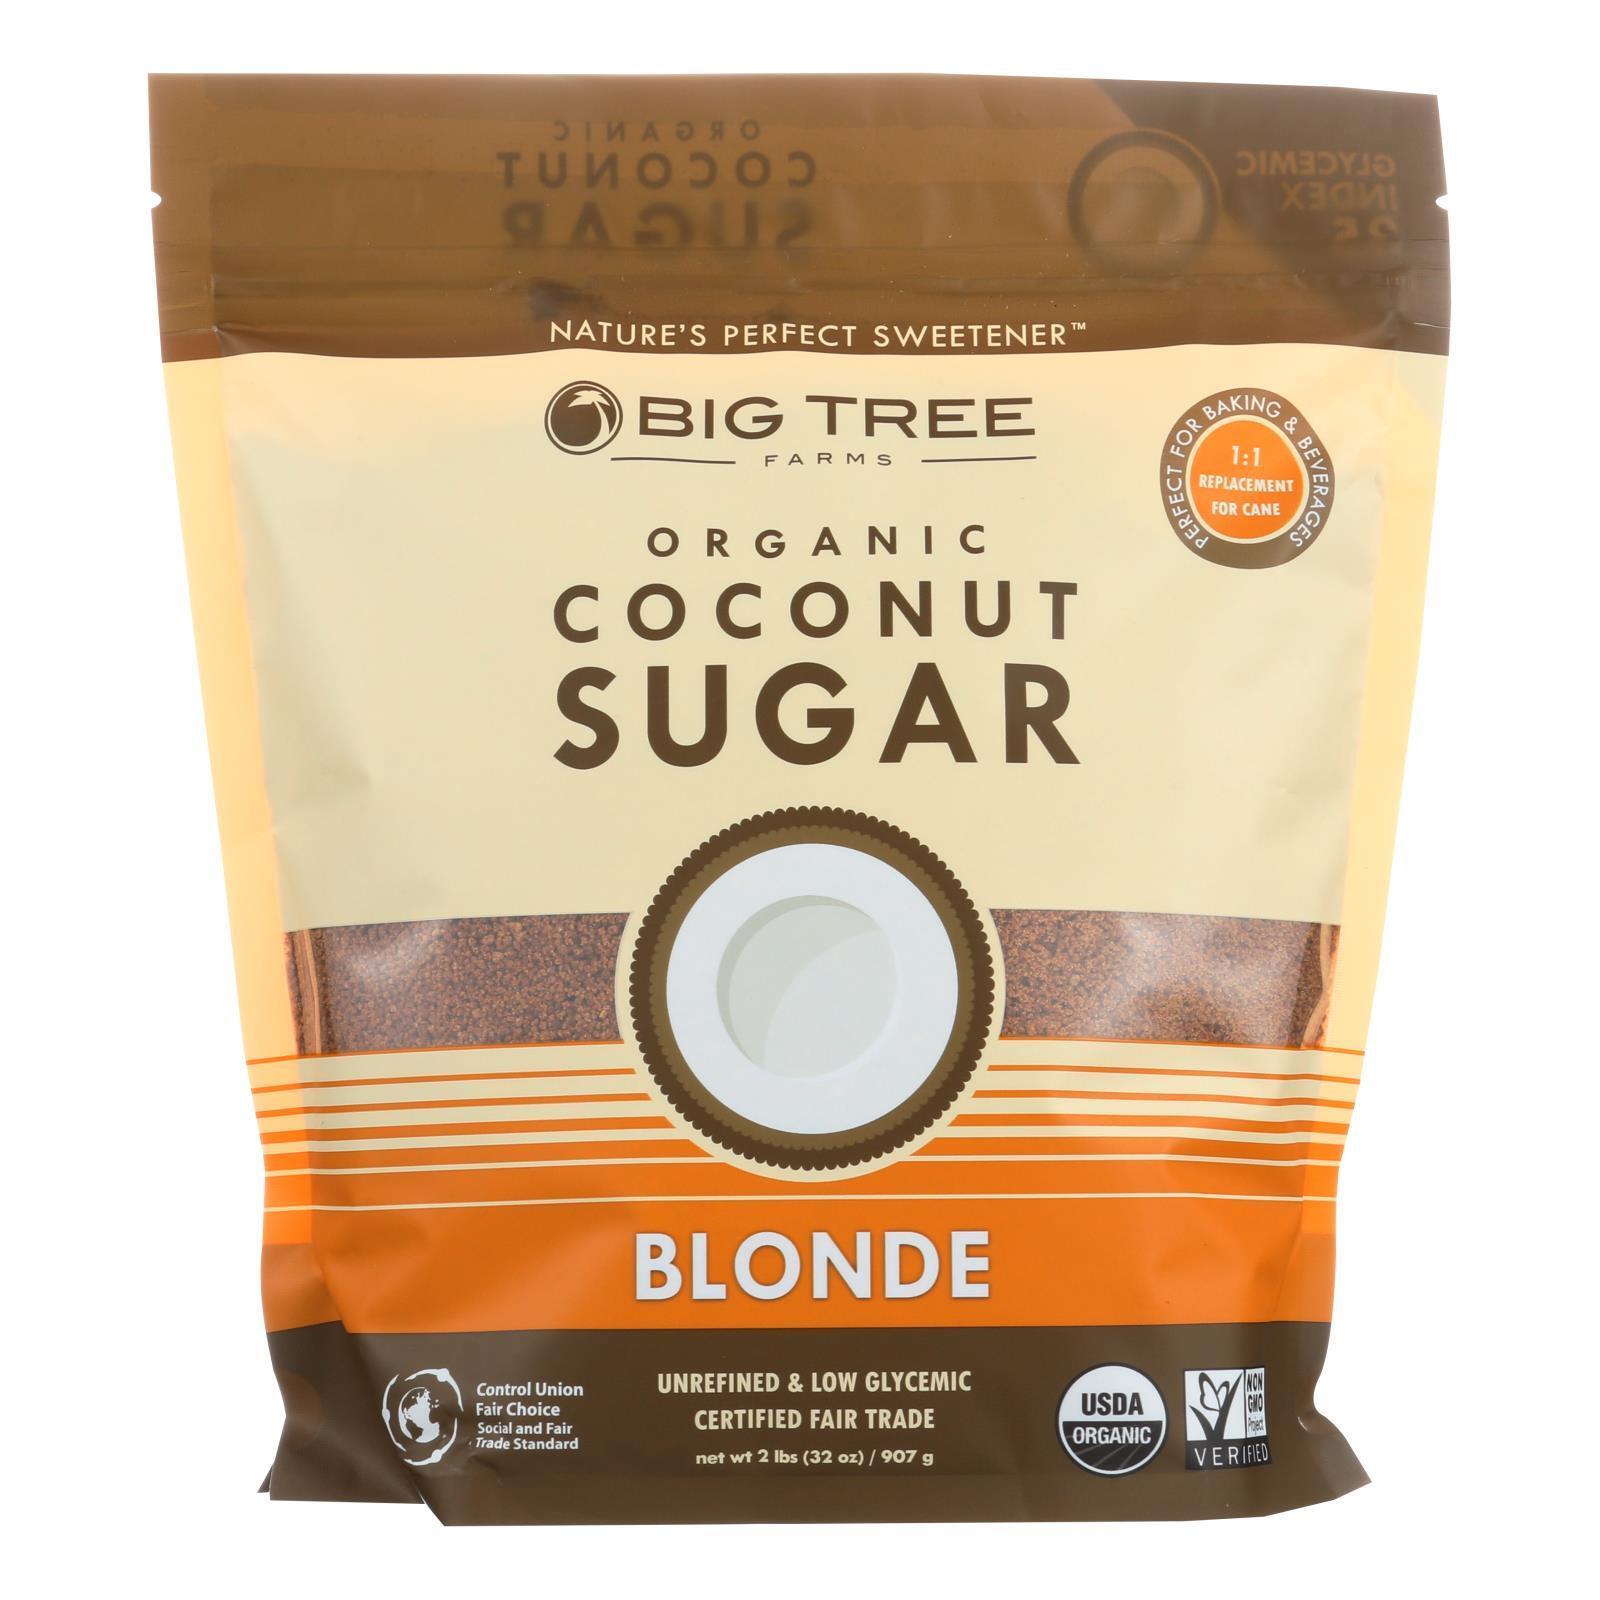 Big Tree Farms Organic Coconut Sugar - Blonde - Case of 6 - 32 oz.